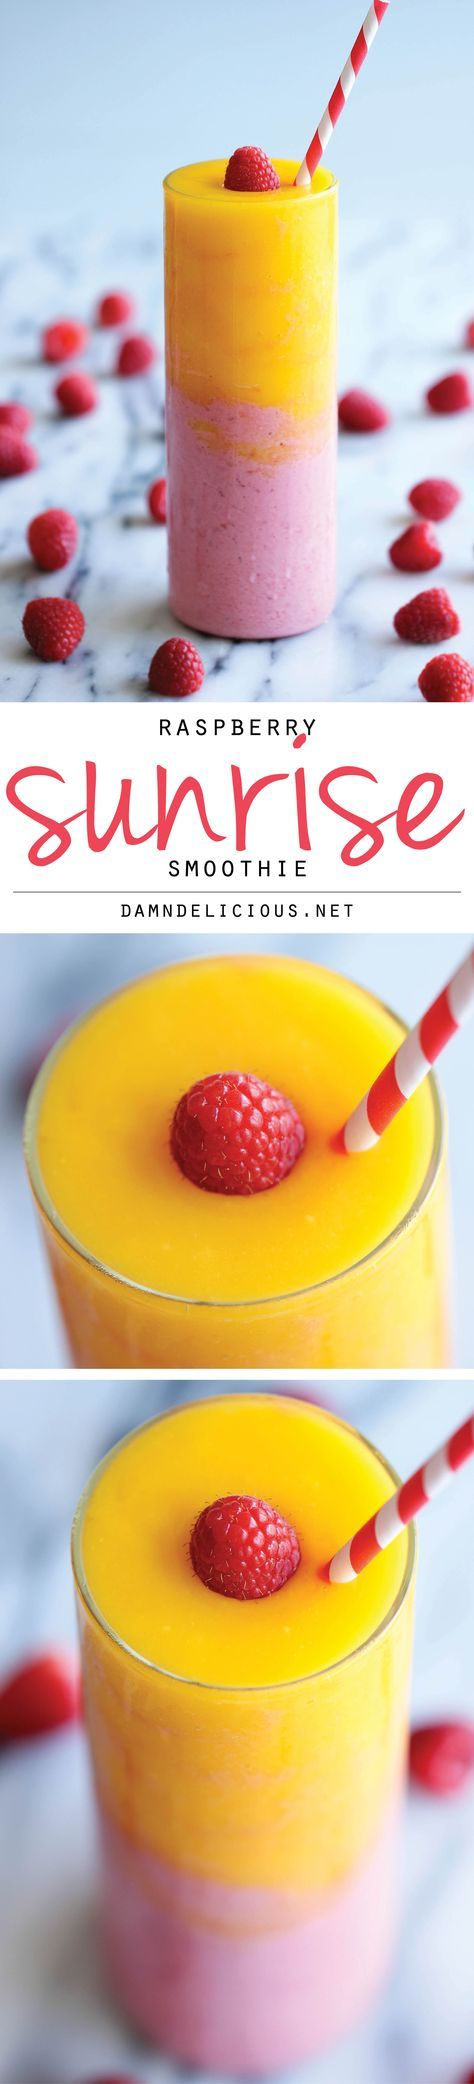 Raspberry Sunrise Smoothie Recipe via Damn Delicious - 4-ingredient raspberry mango smoothie - so easy and amazingly refreshing!